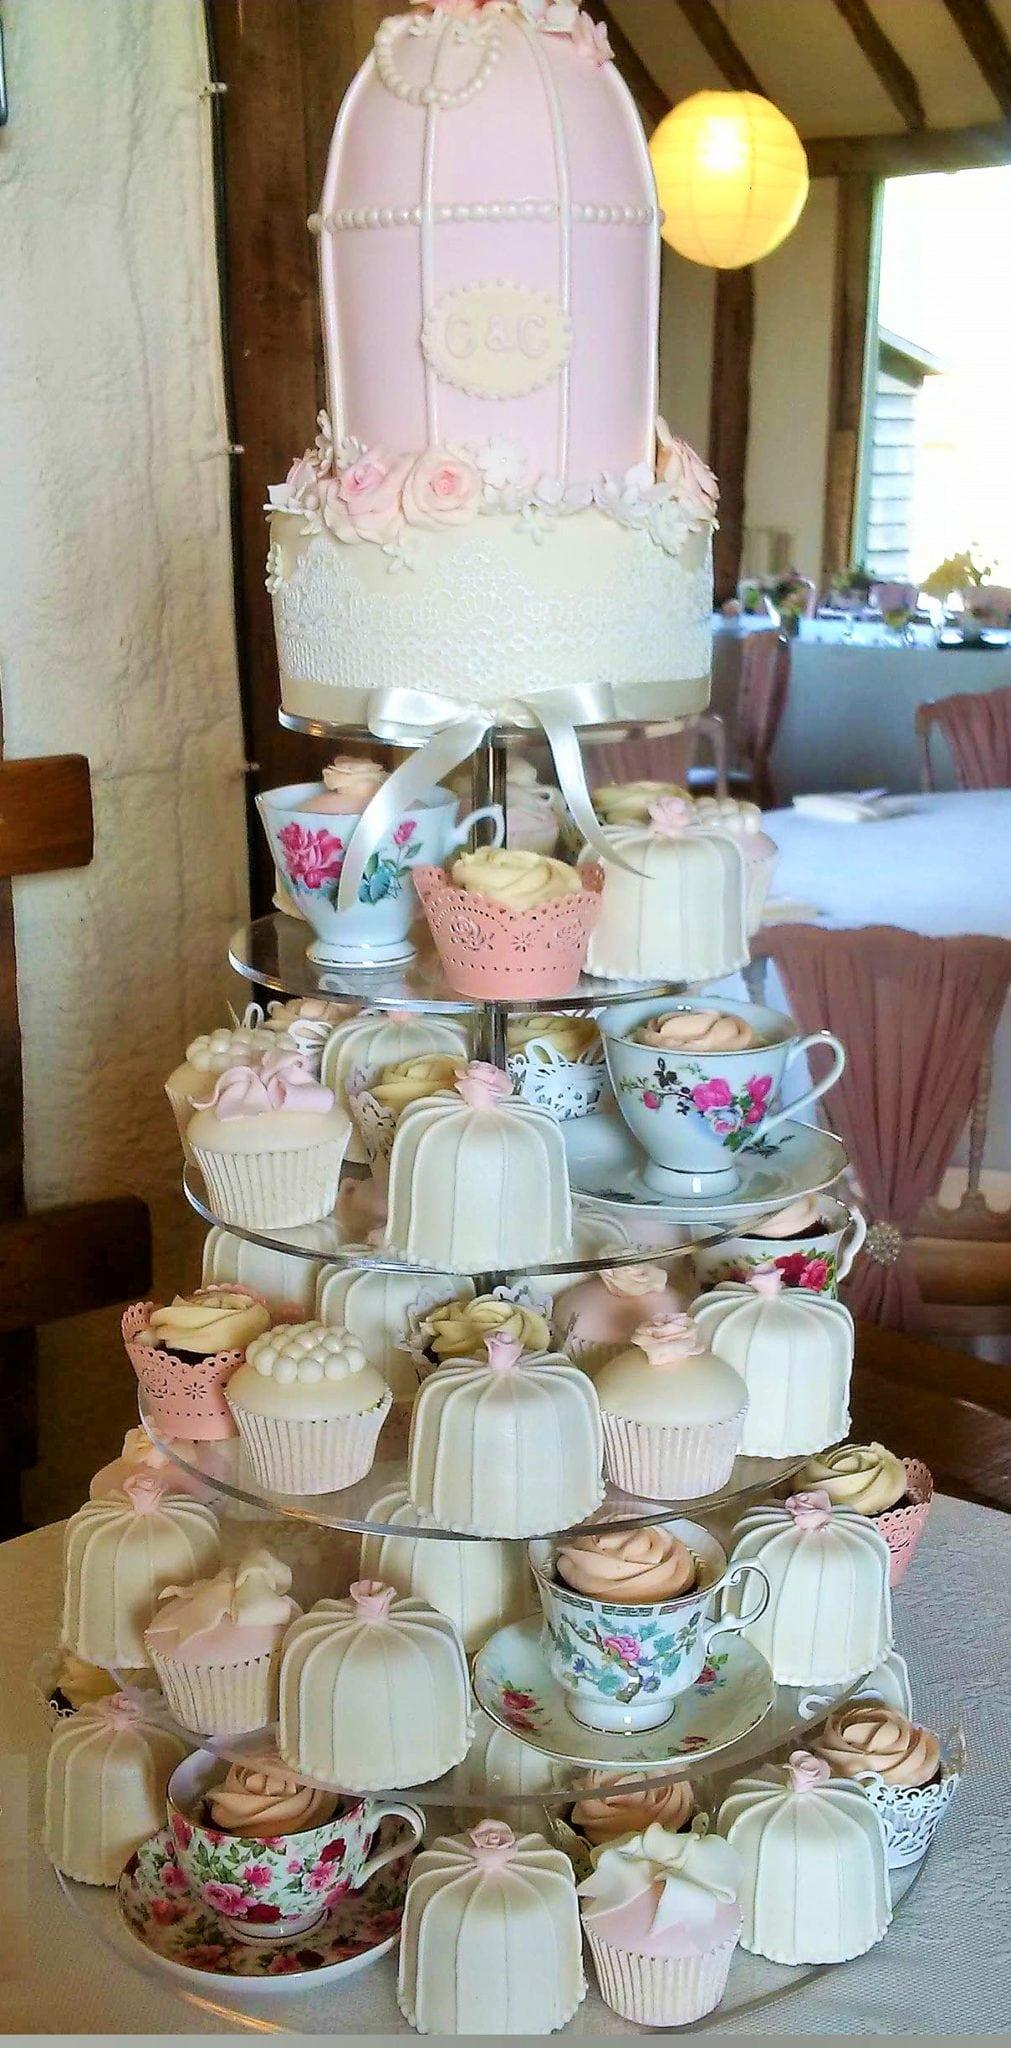 cupcakes & teacups